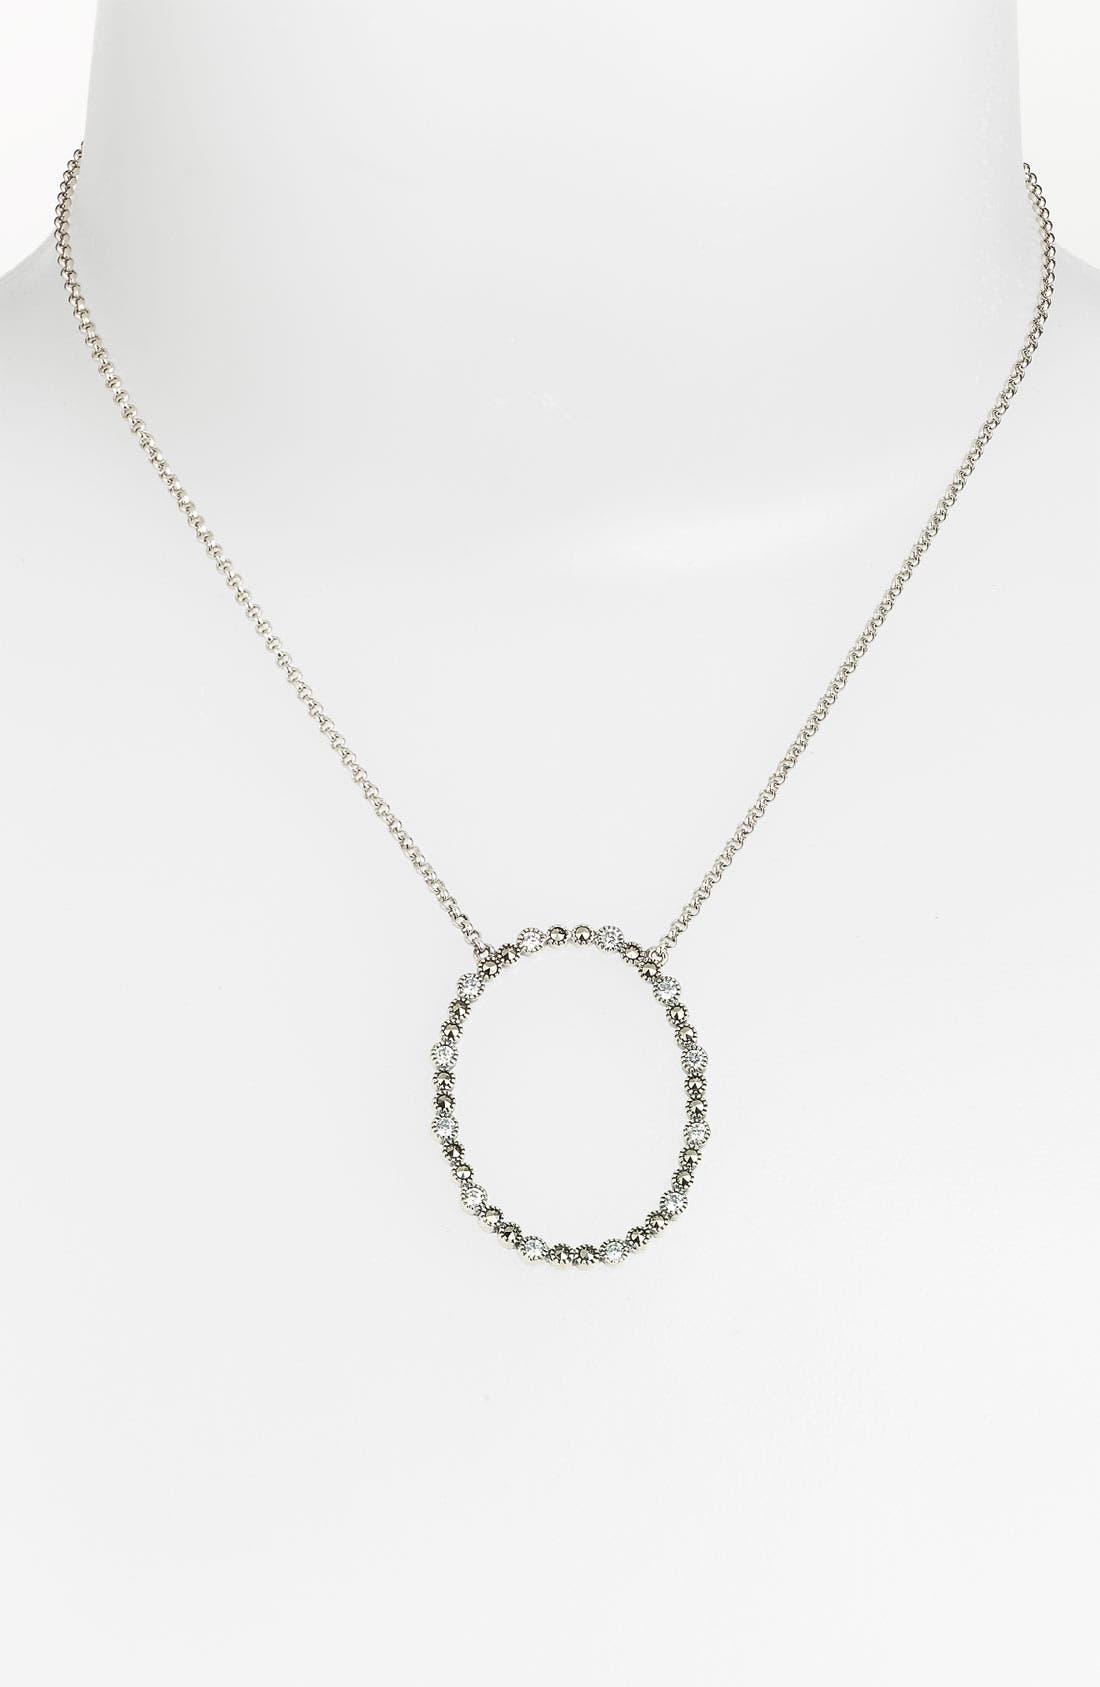 Alternate Image 1 Selected - Judith Jack 'Starlight' Open Pendant Necklace